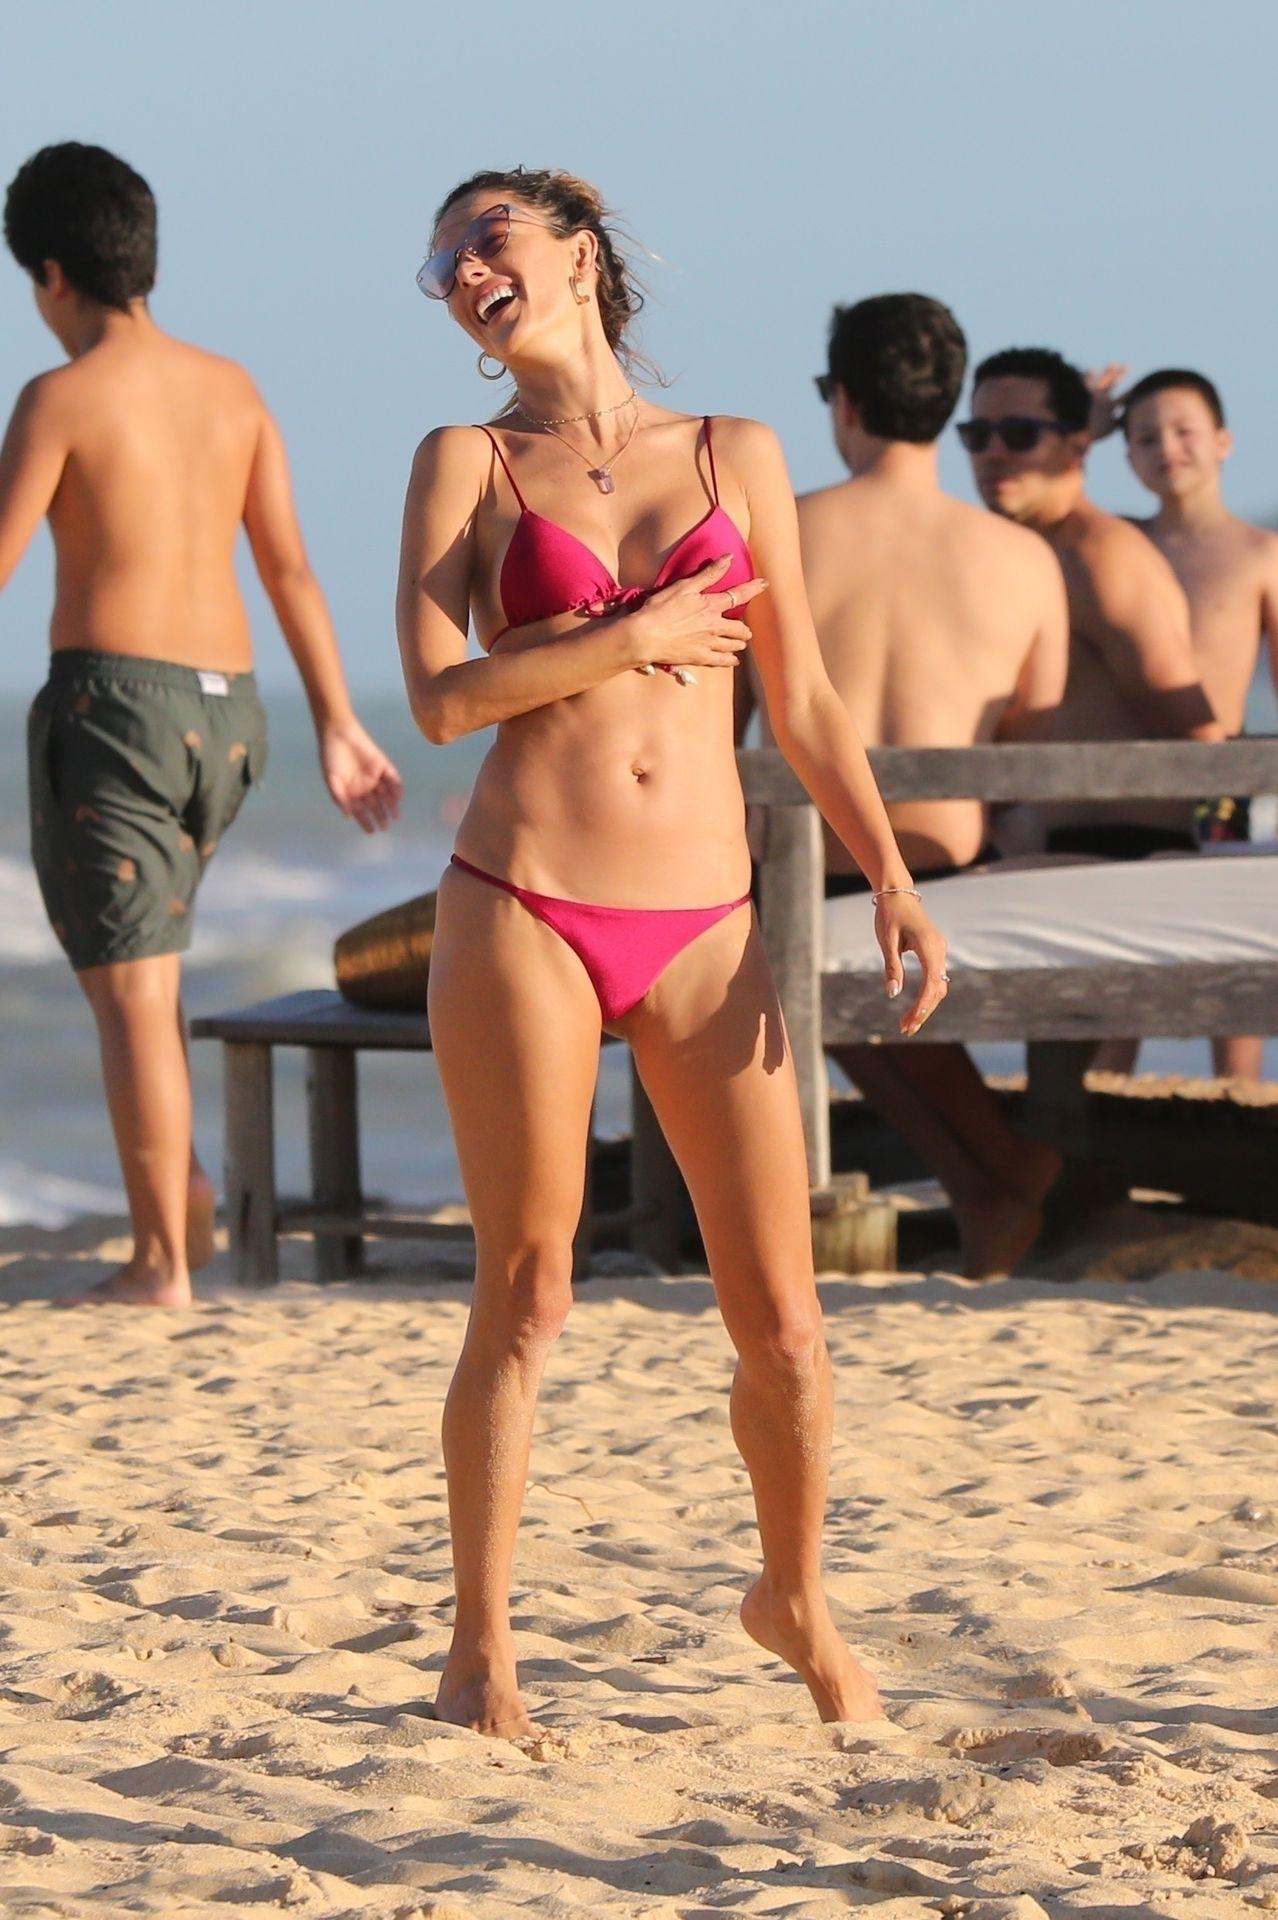 Alessandra-Ambrosio-Sexy-110-thefappeningblog.com_.jpg